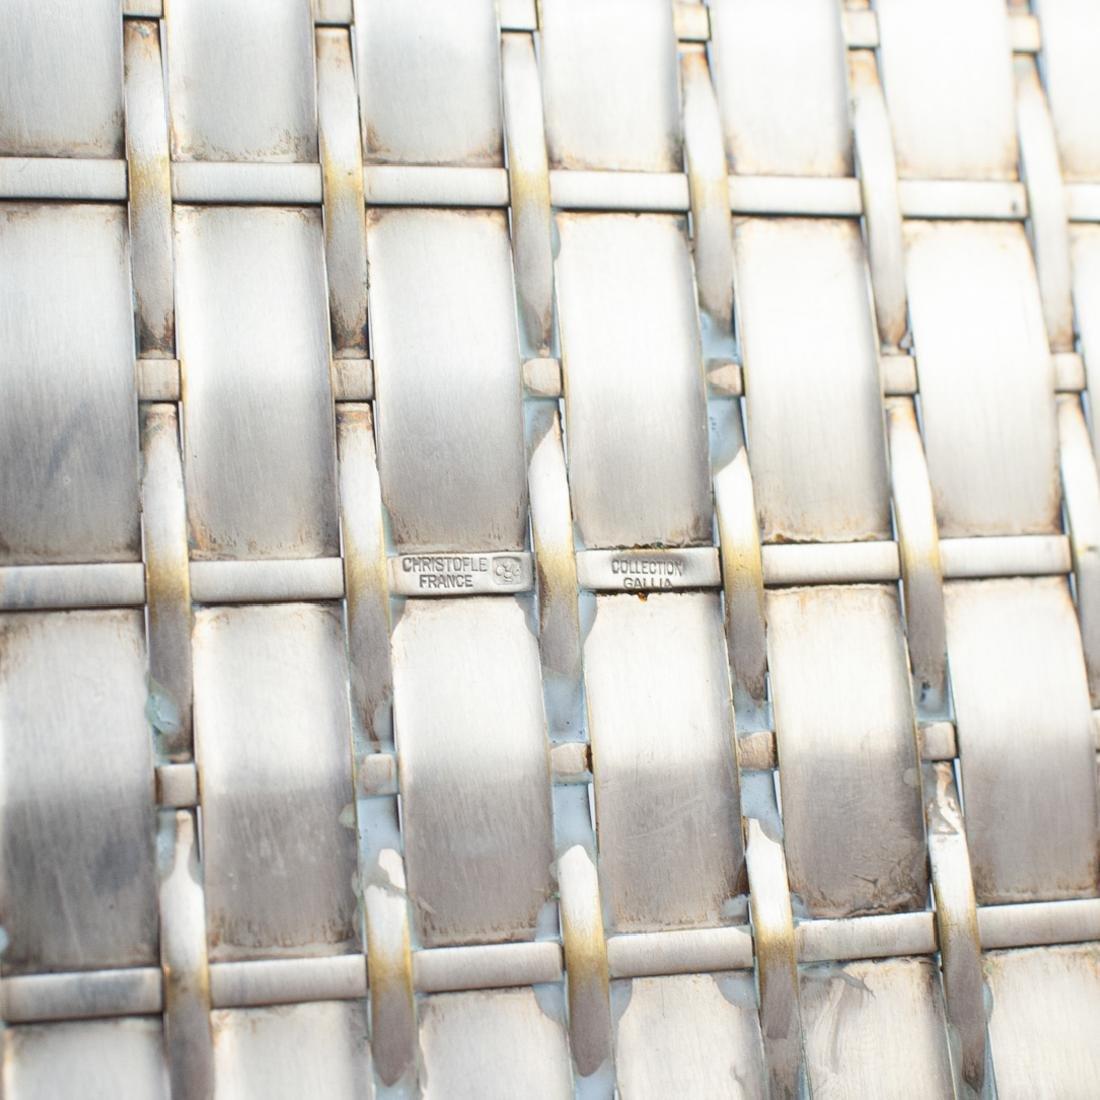 Christofle Silver-Plated Basket - 5